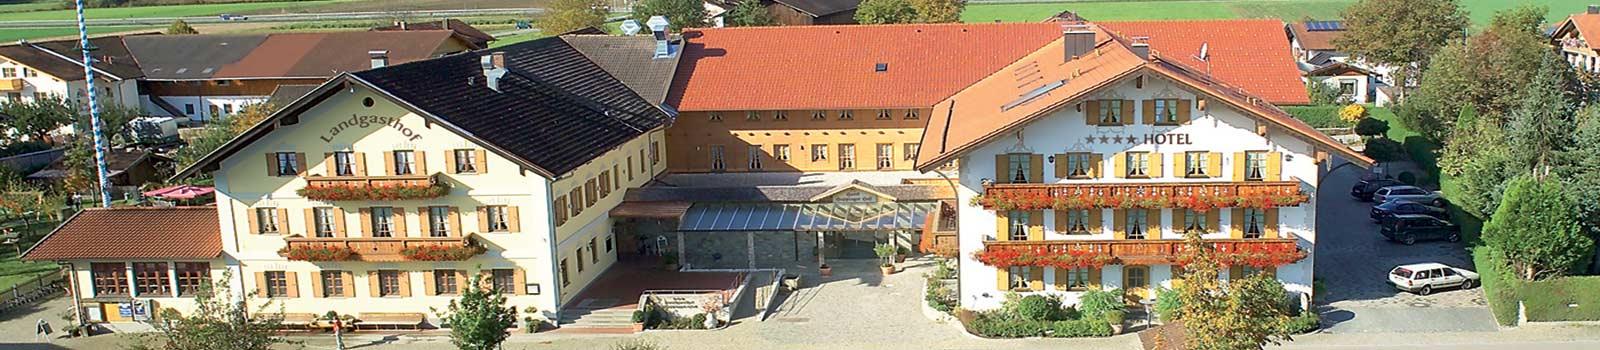 Landgasthof - Hotel Happinger Hof